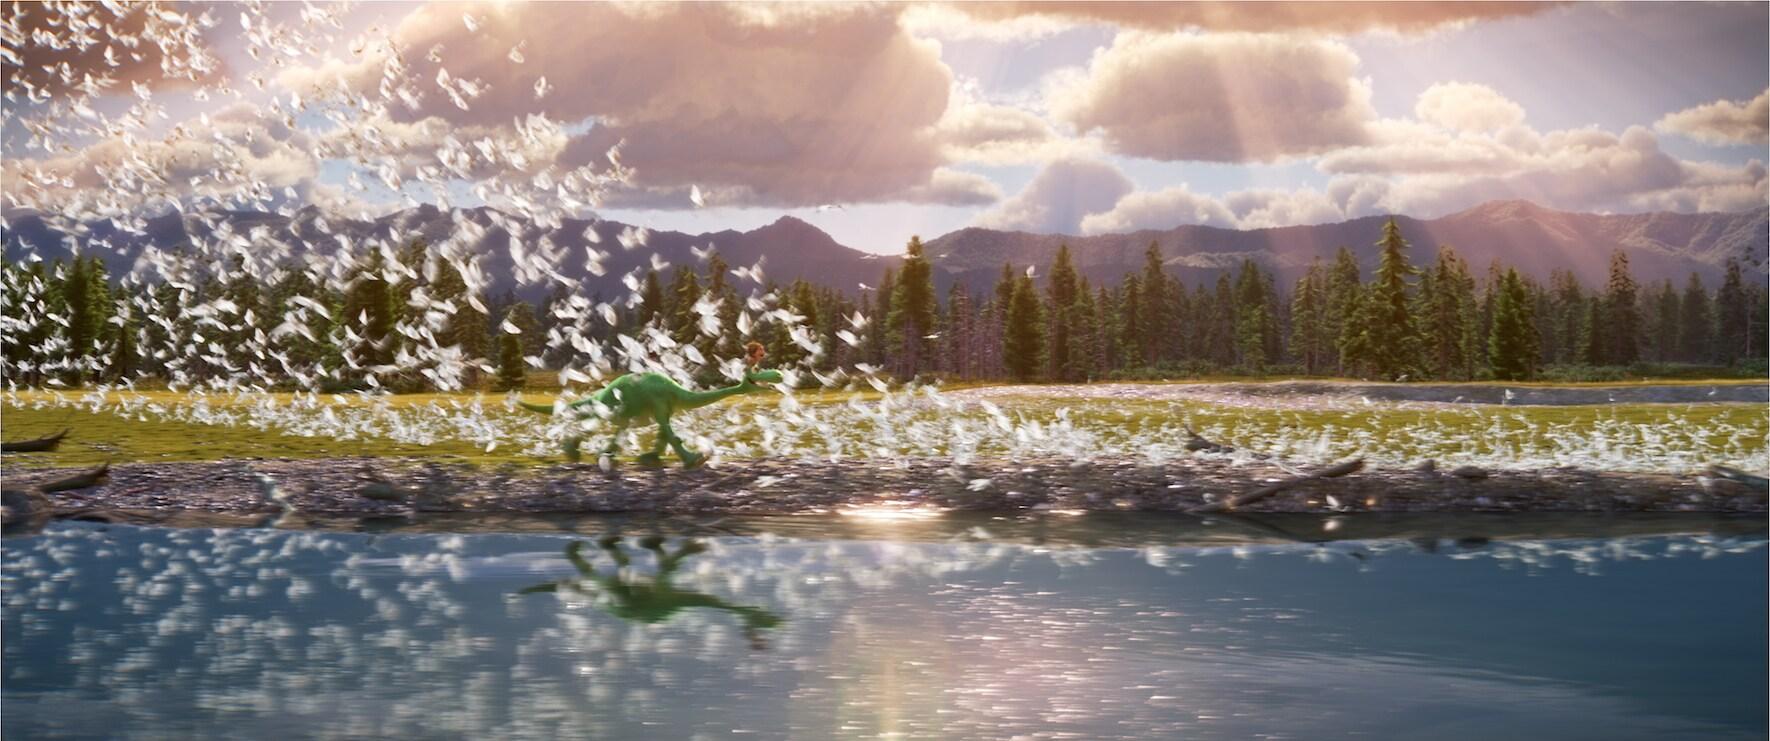 "Raymond Ochoa (Aldo) walks through a flock of birds in ""The Good Dinosaur"""